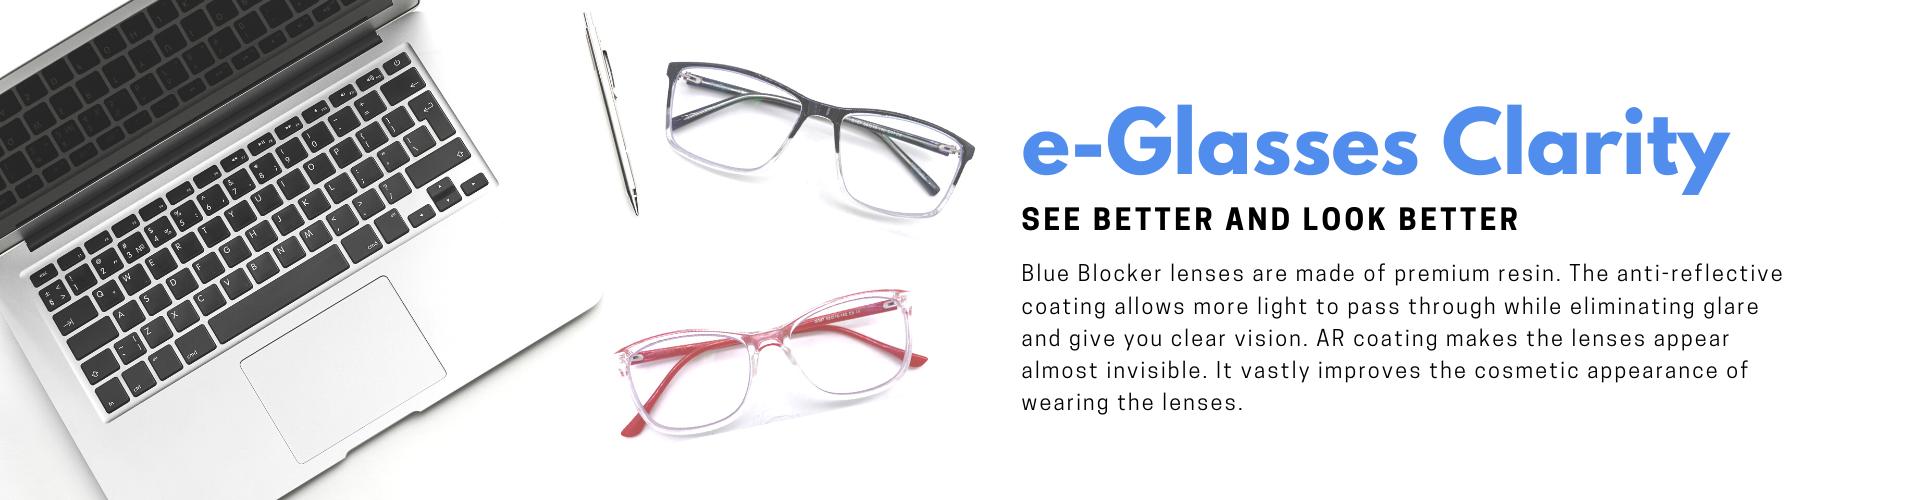 e-Glasses Clarity 高清抗藍光眼鏡